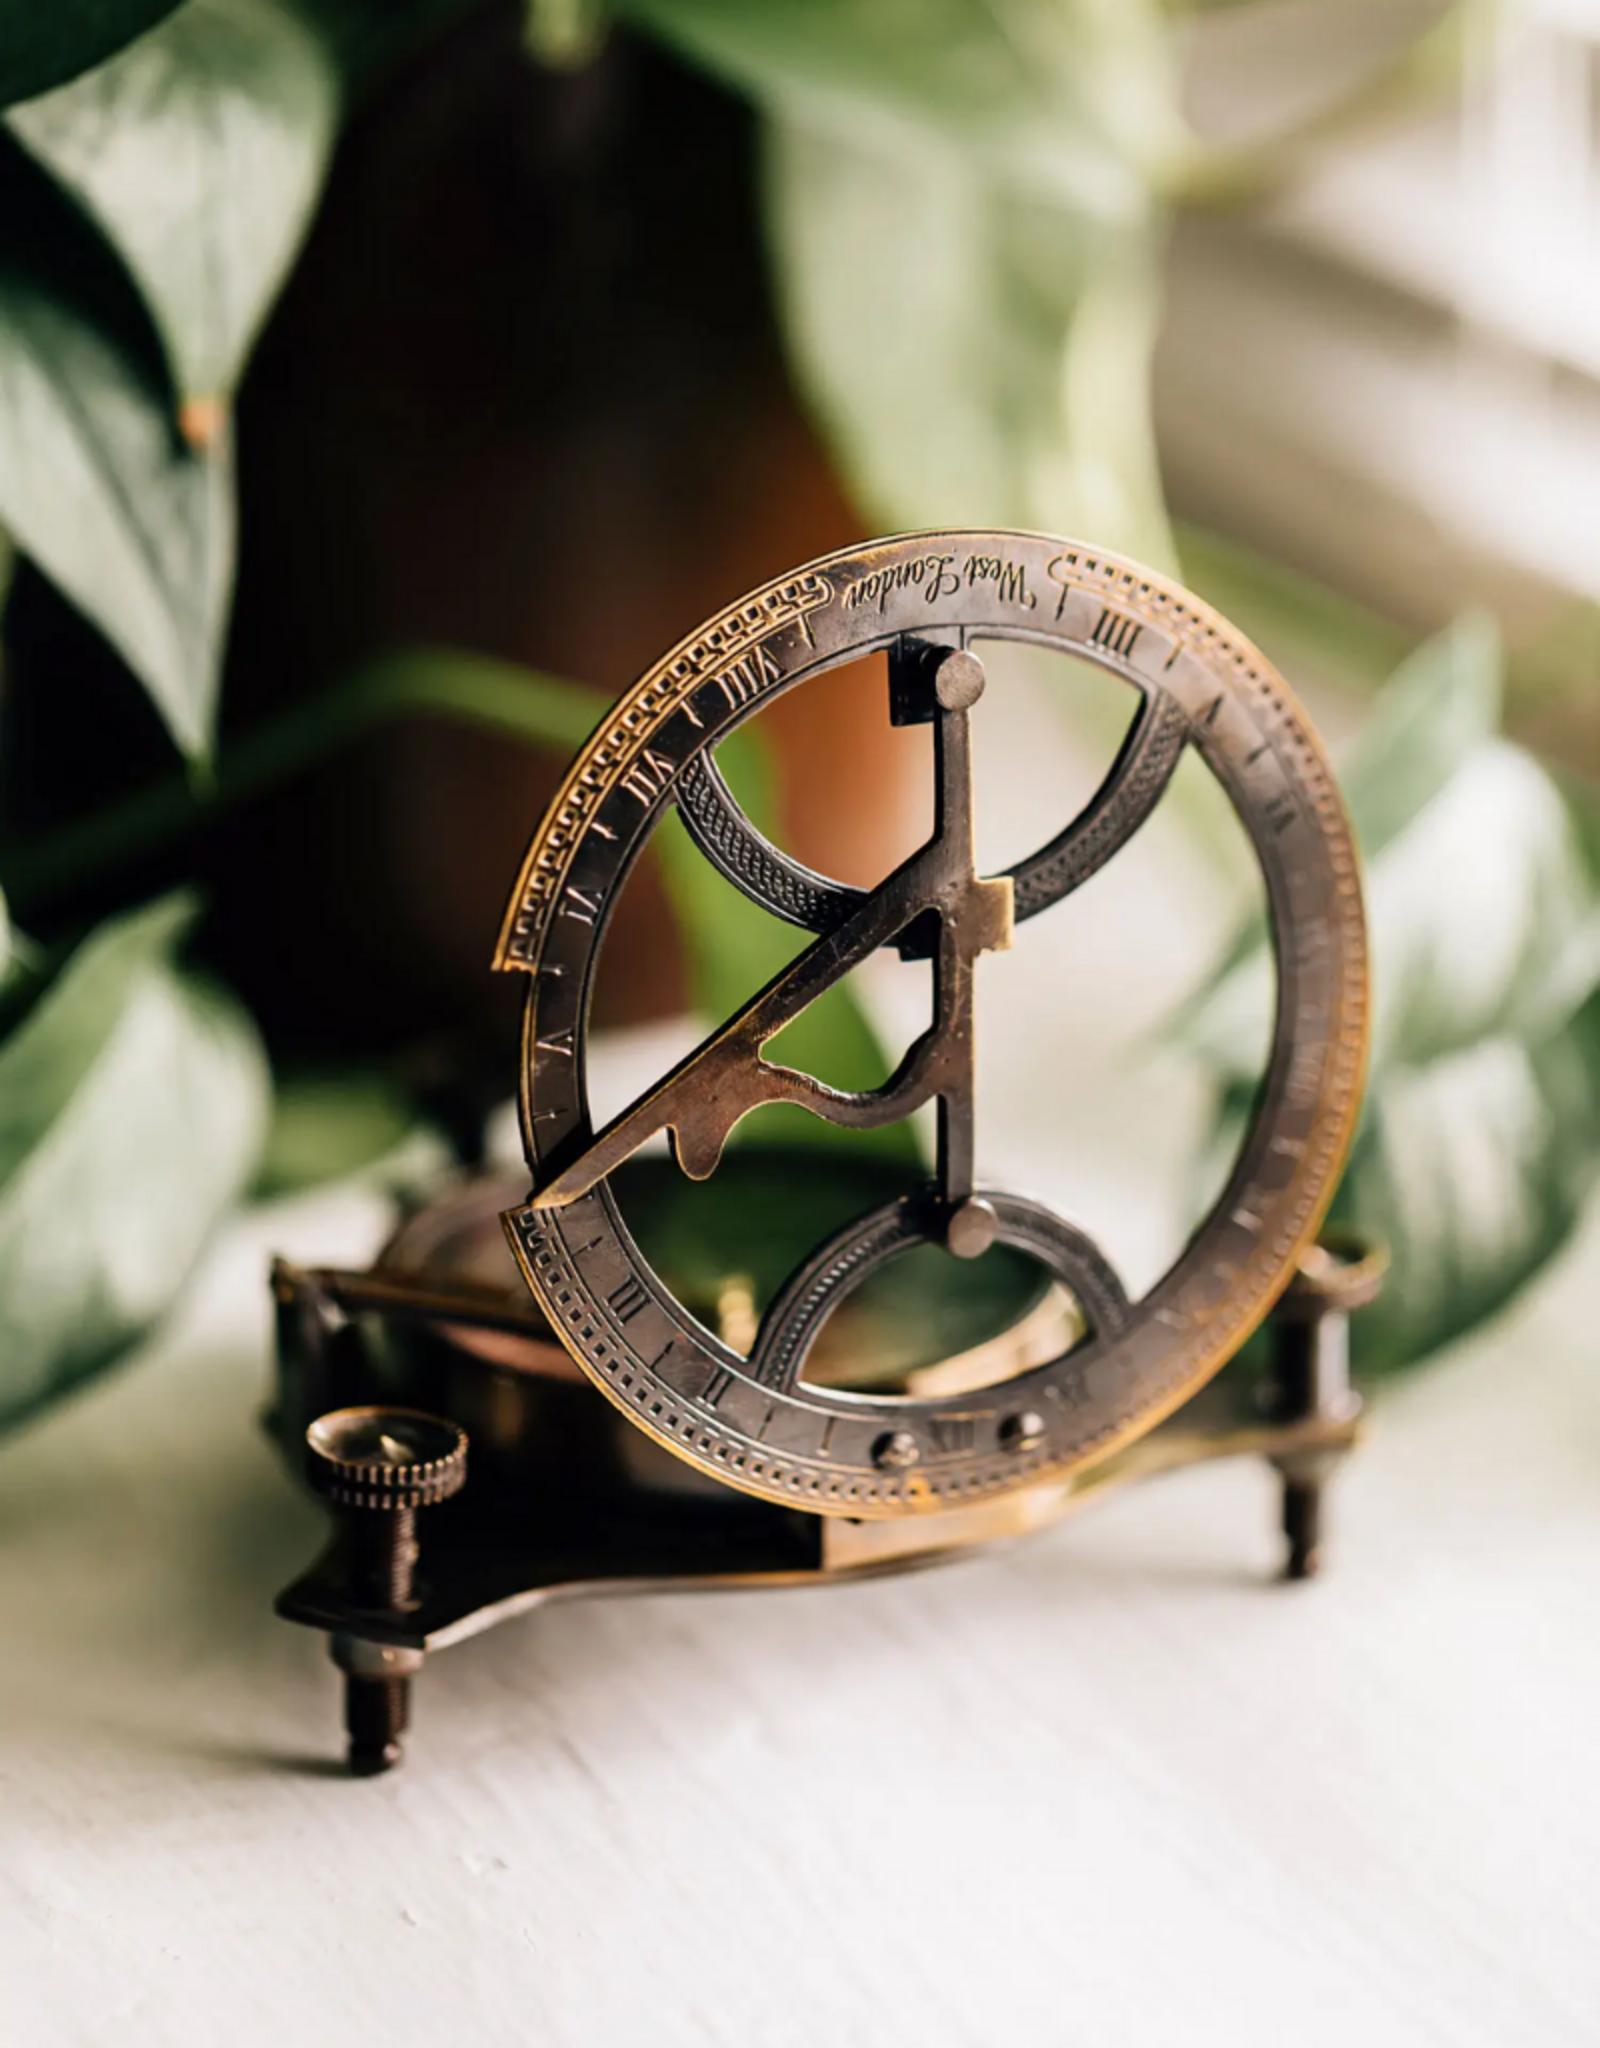 TTV USA Sundial Compass